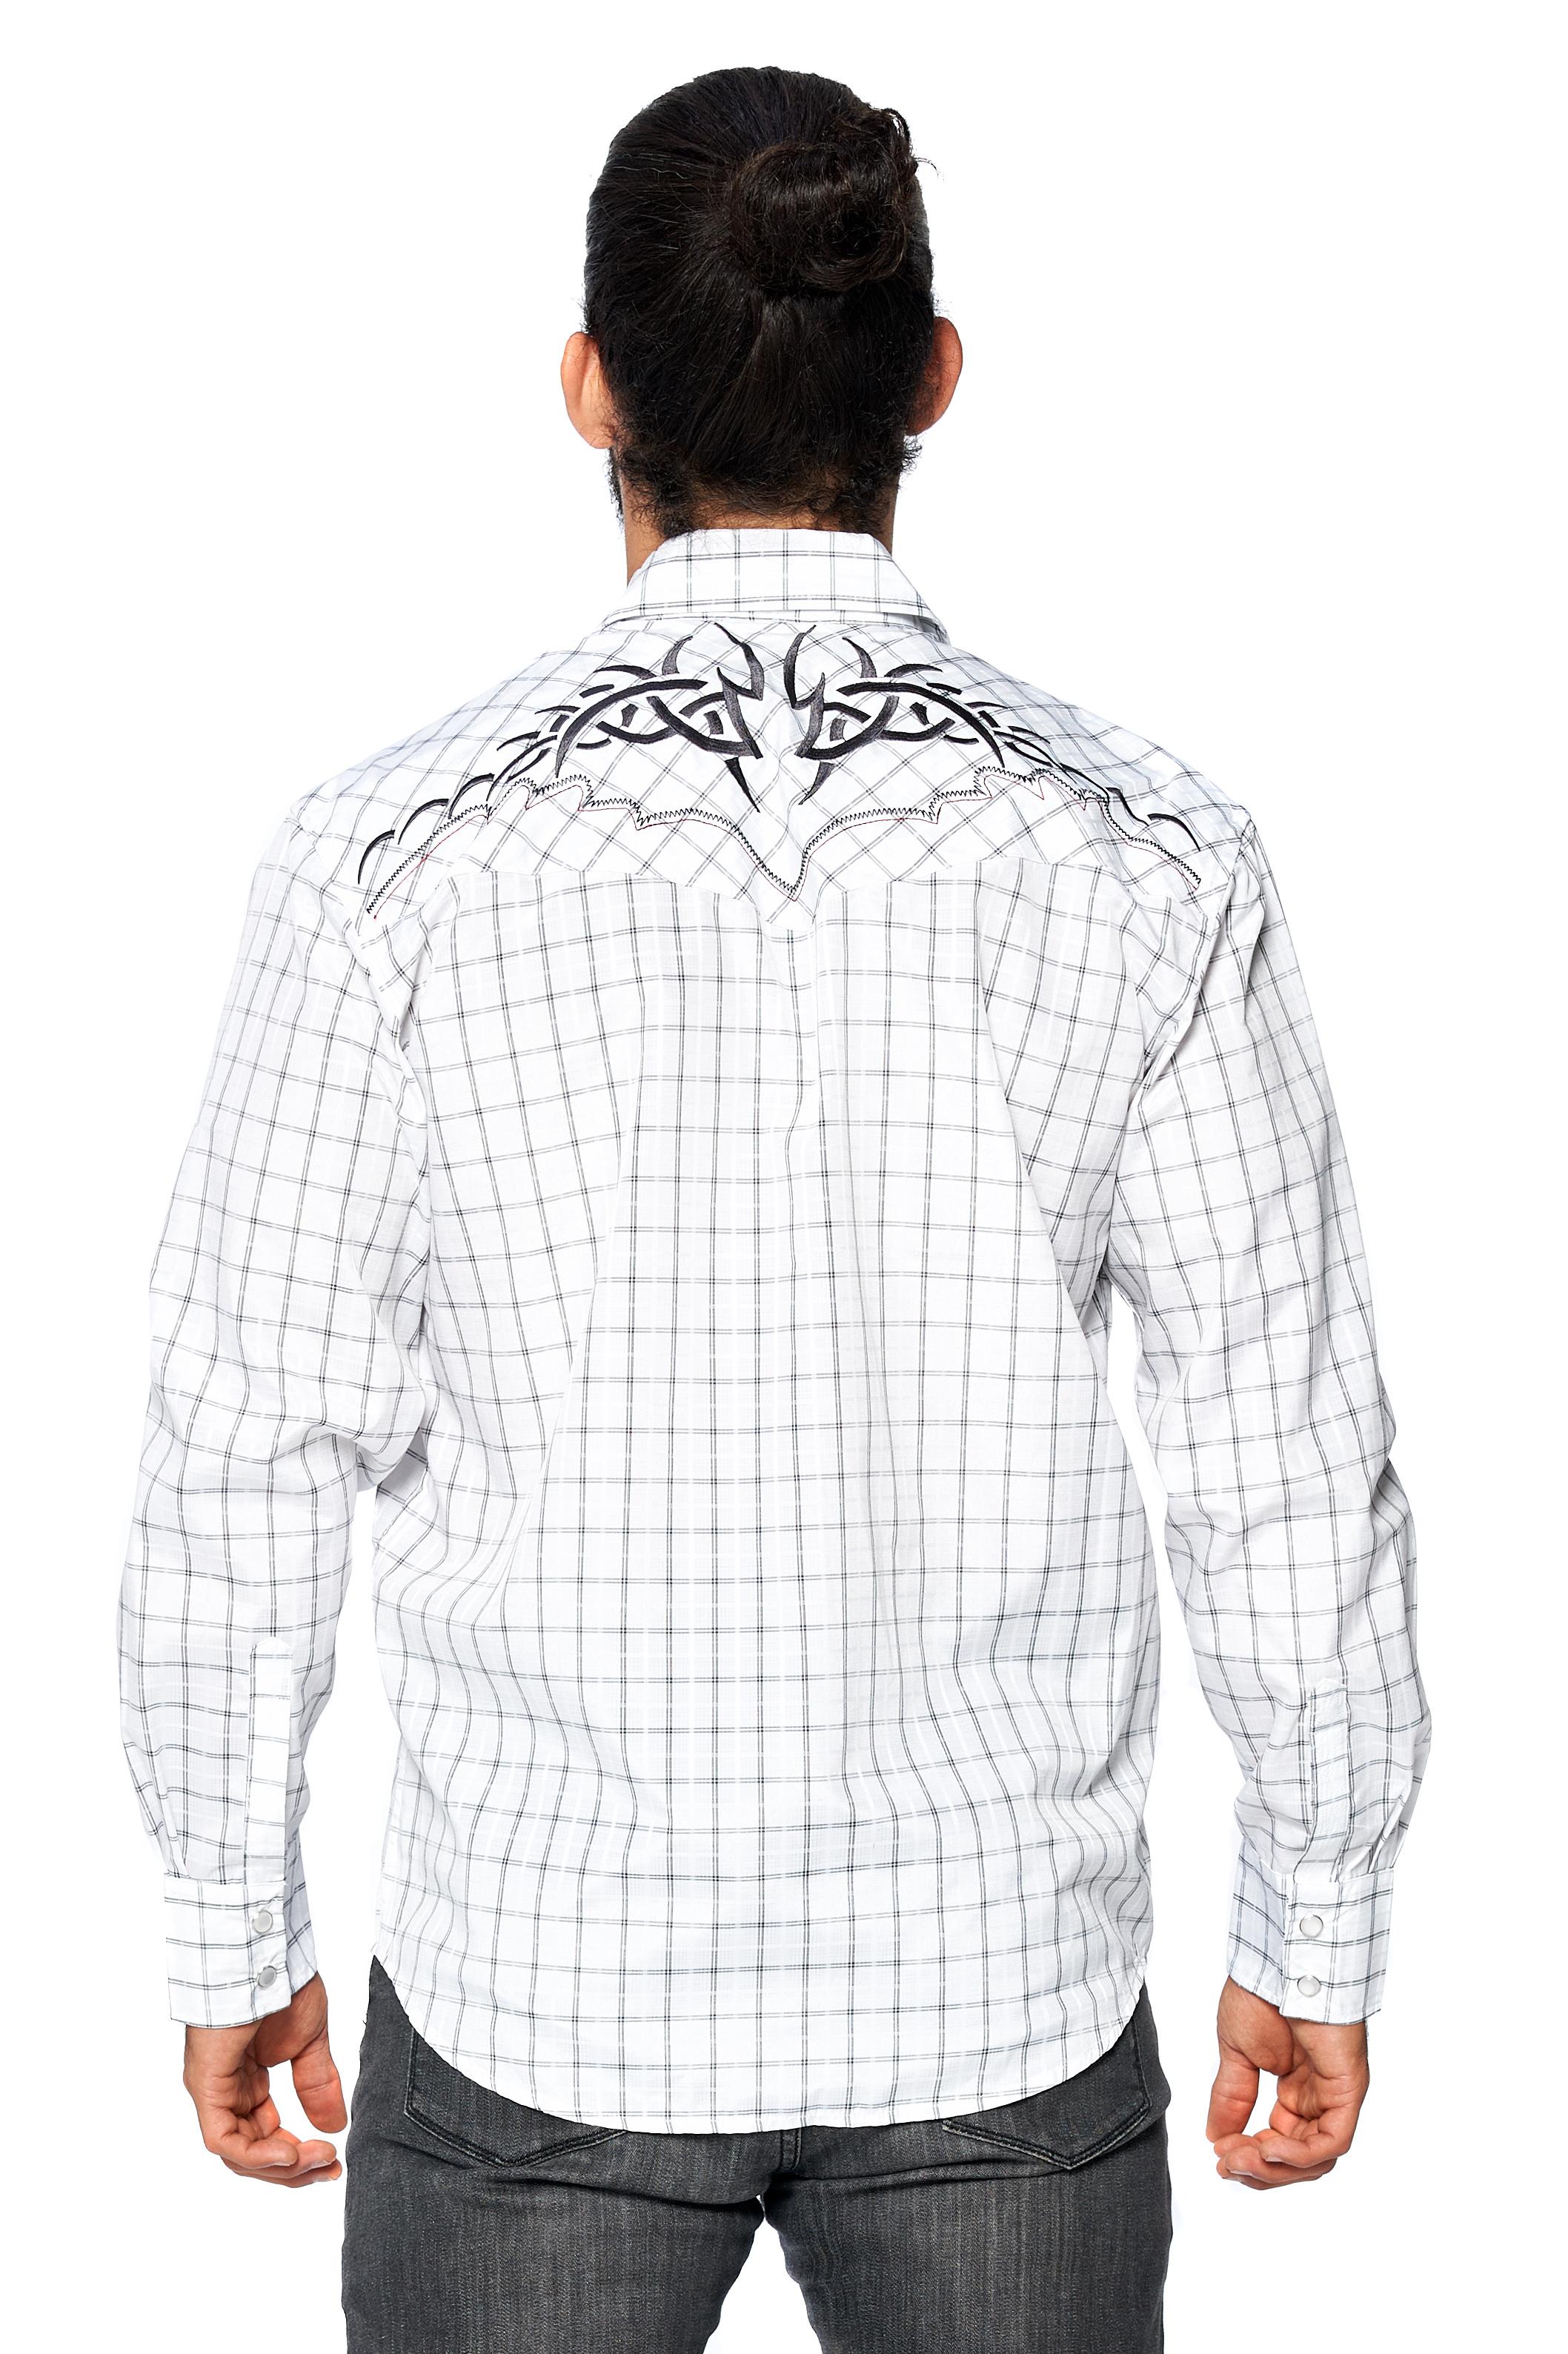 LW-Men-039-s-Pearl-Snap-Tribal-Stylish-Printed-Woven-Western-Vaquero-Rodeo-Shirt thumbnail 65